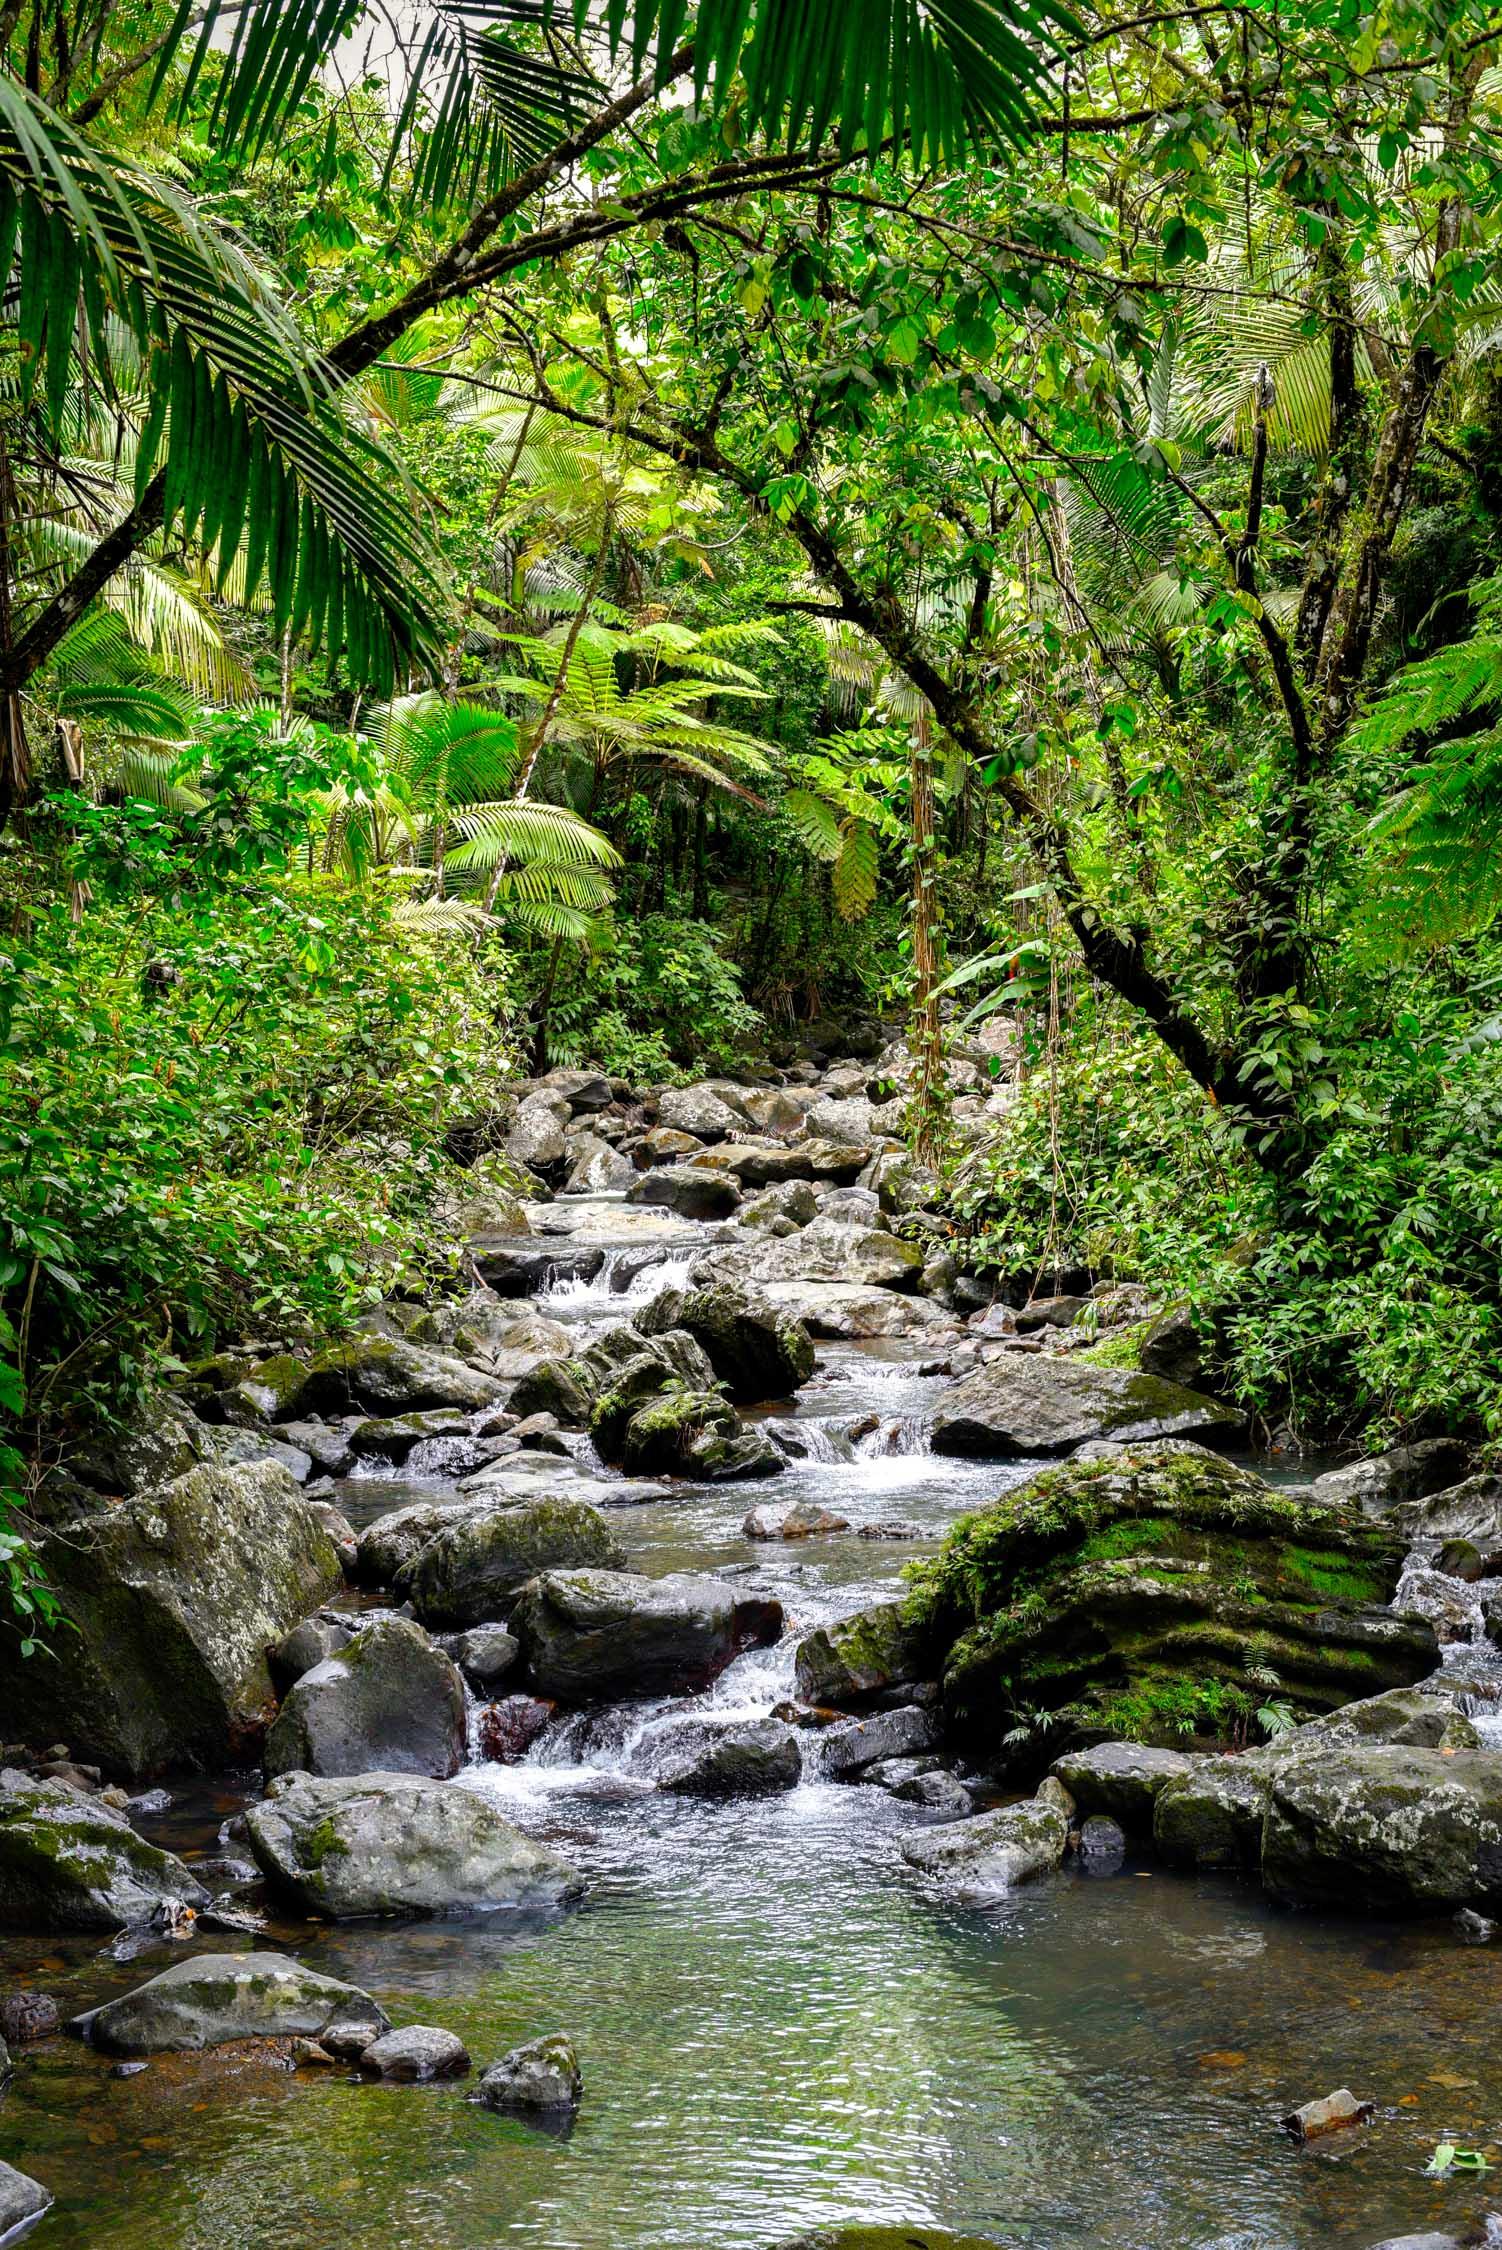 Climbing the falls at El Yunque Rainforest in Puerto Rico